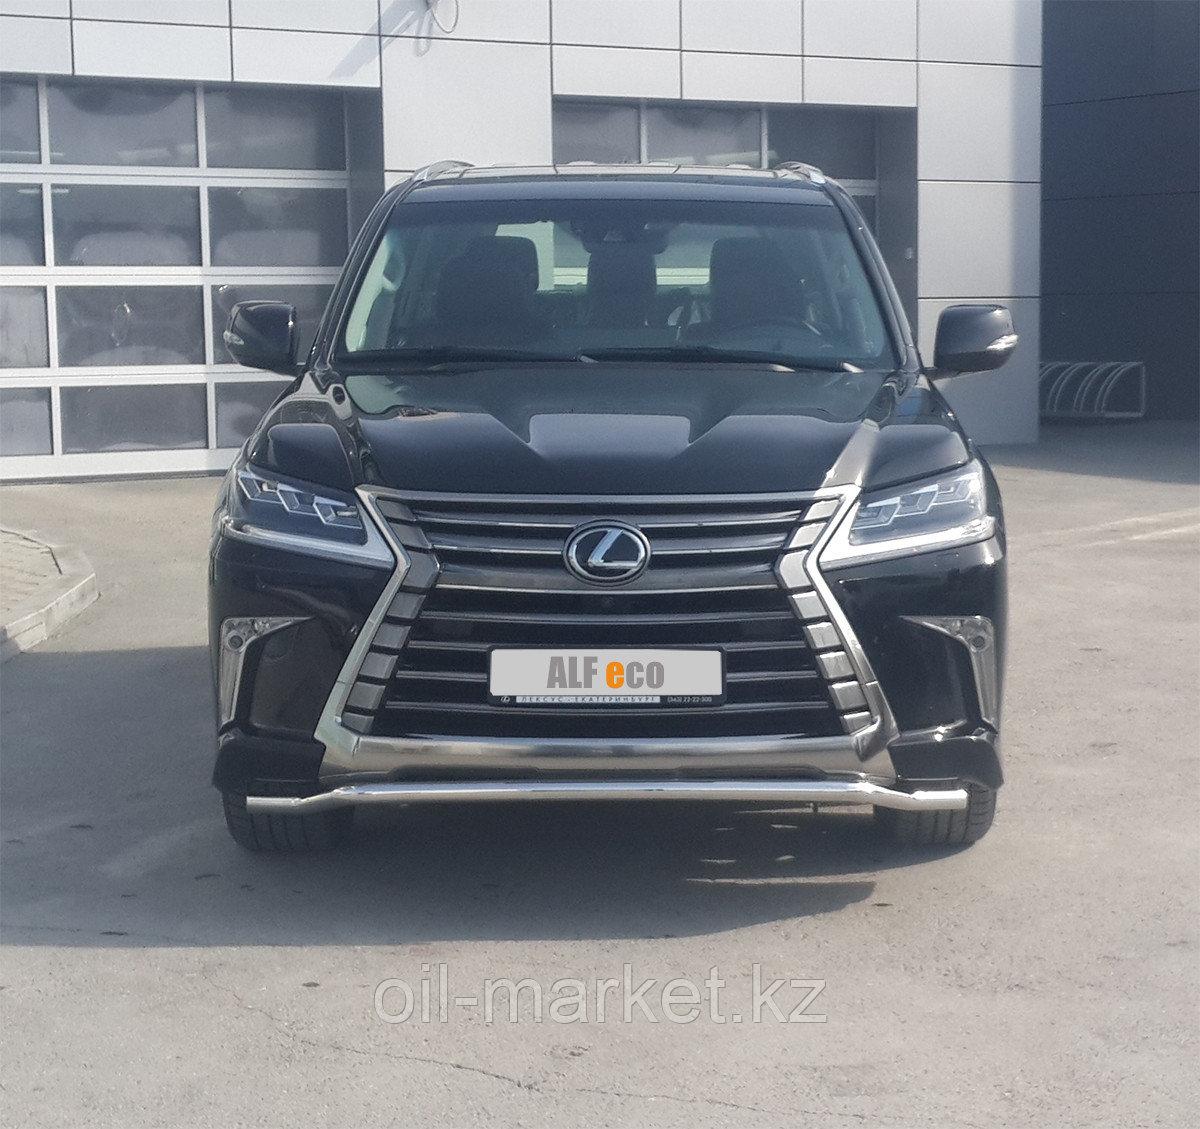 Защита переднего бампера, волна ( D 50.8) для Lexus LX 570 (2015-)